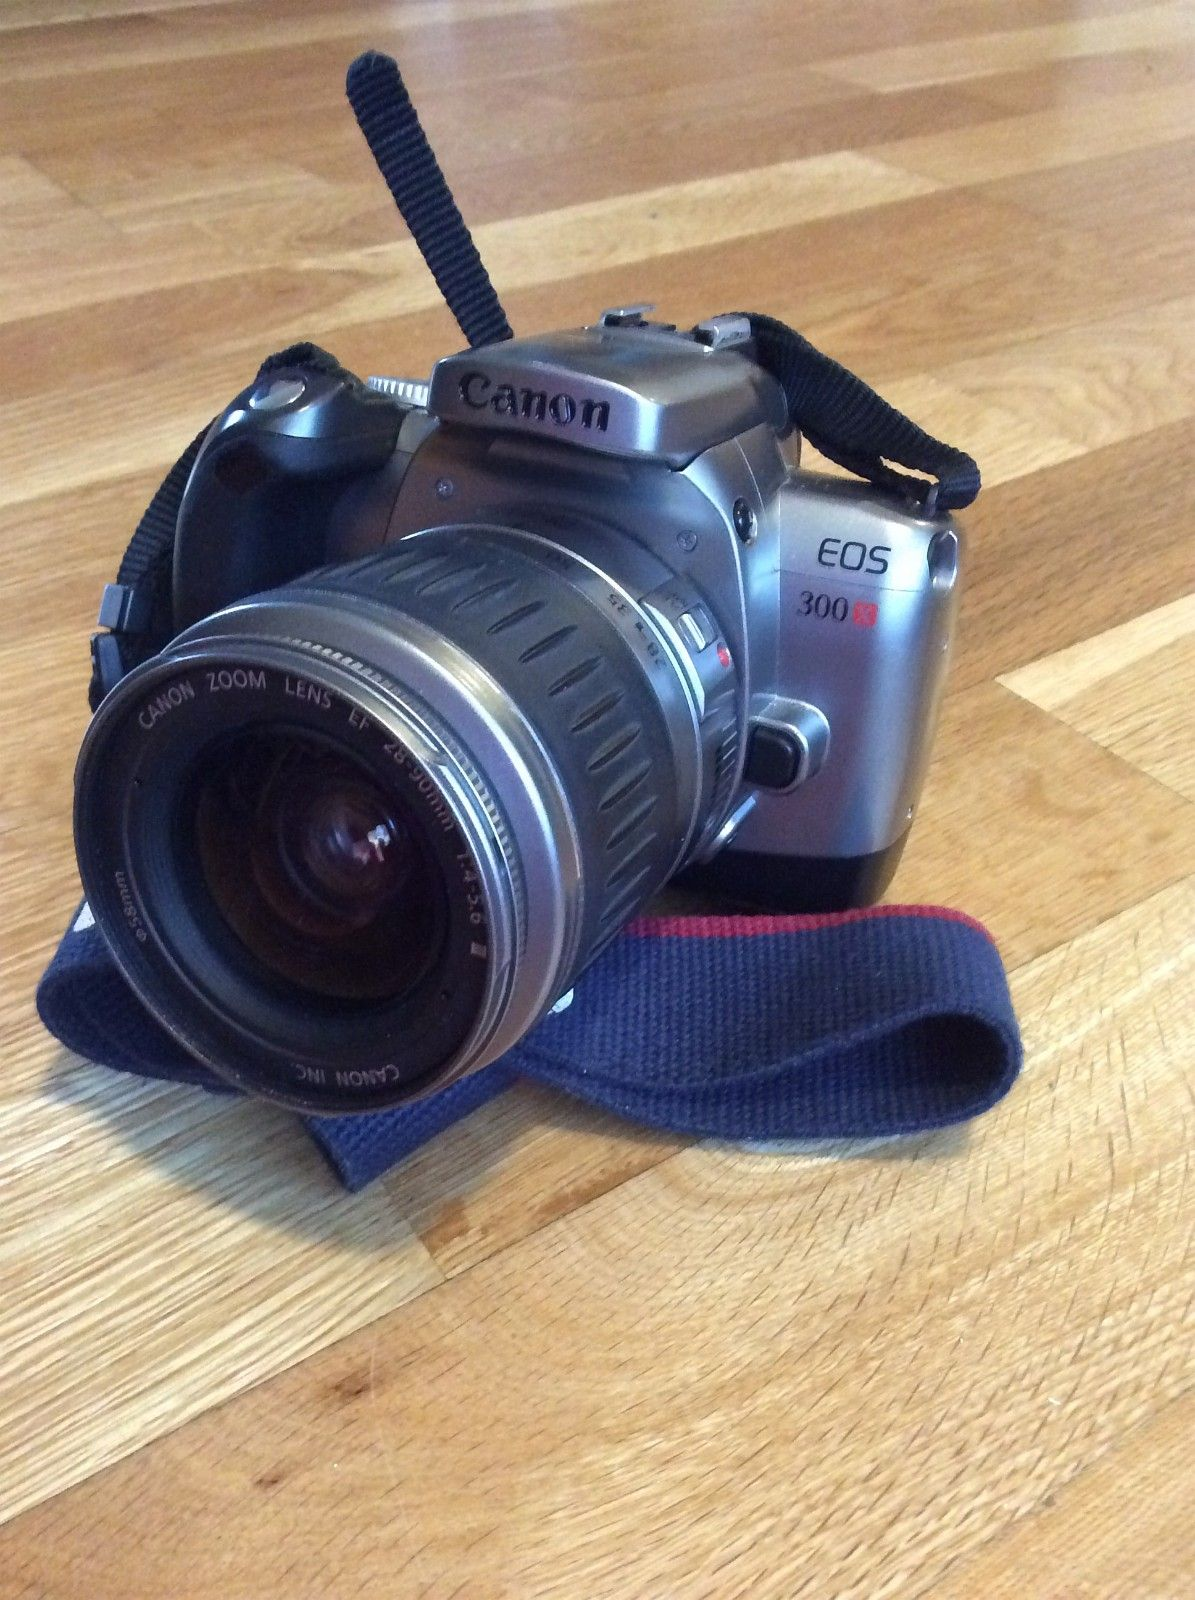 Canon EOS 300 x analog speilrefleks mm - Ottestad  - Canon EOS 300 x analog speilrefleks selges. 4 objektiver følger med. Canon zoom lens EF 28-90 mm 1:4-5,6 Sigma UC zoom 28-70 mm 1:2,8-5 Sigma UC zoom 70-210 mm 1:4-5,6 Sigma zoom 17-35 mm 1:2,8-4 - Ottestad